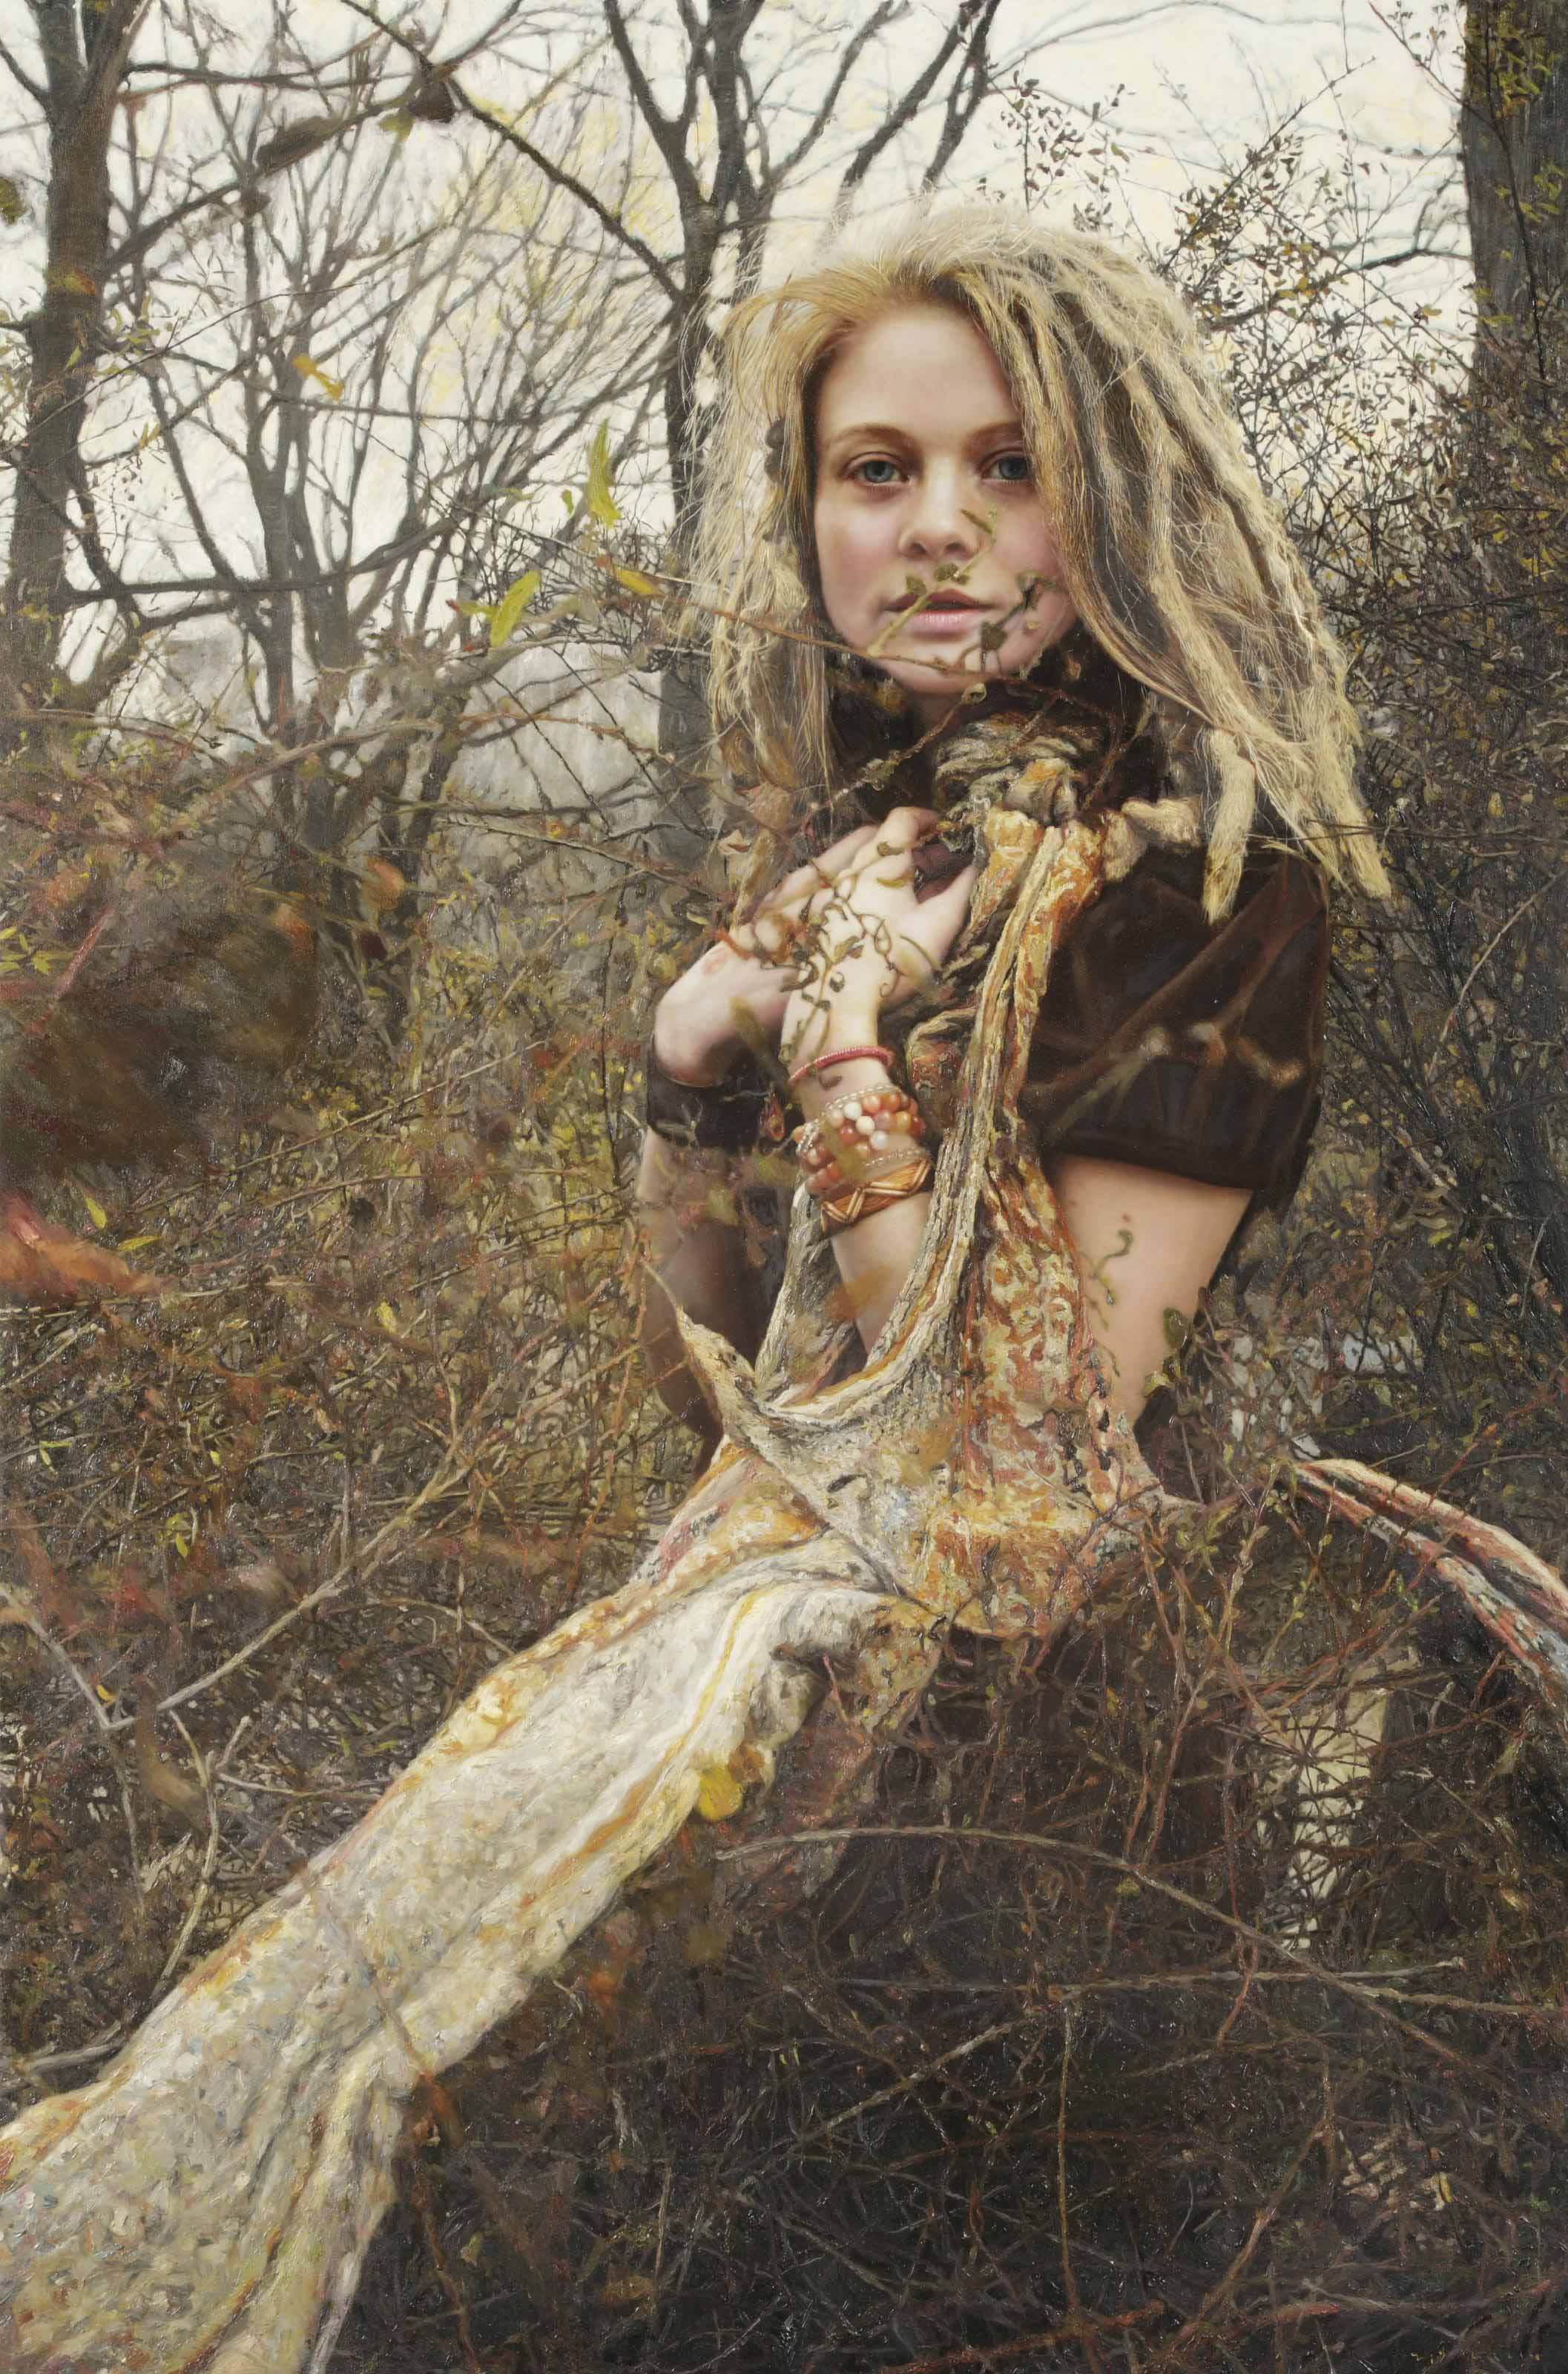 Untitled; Priscilla with vines